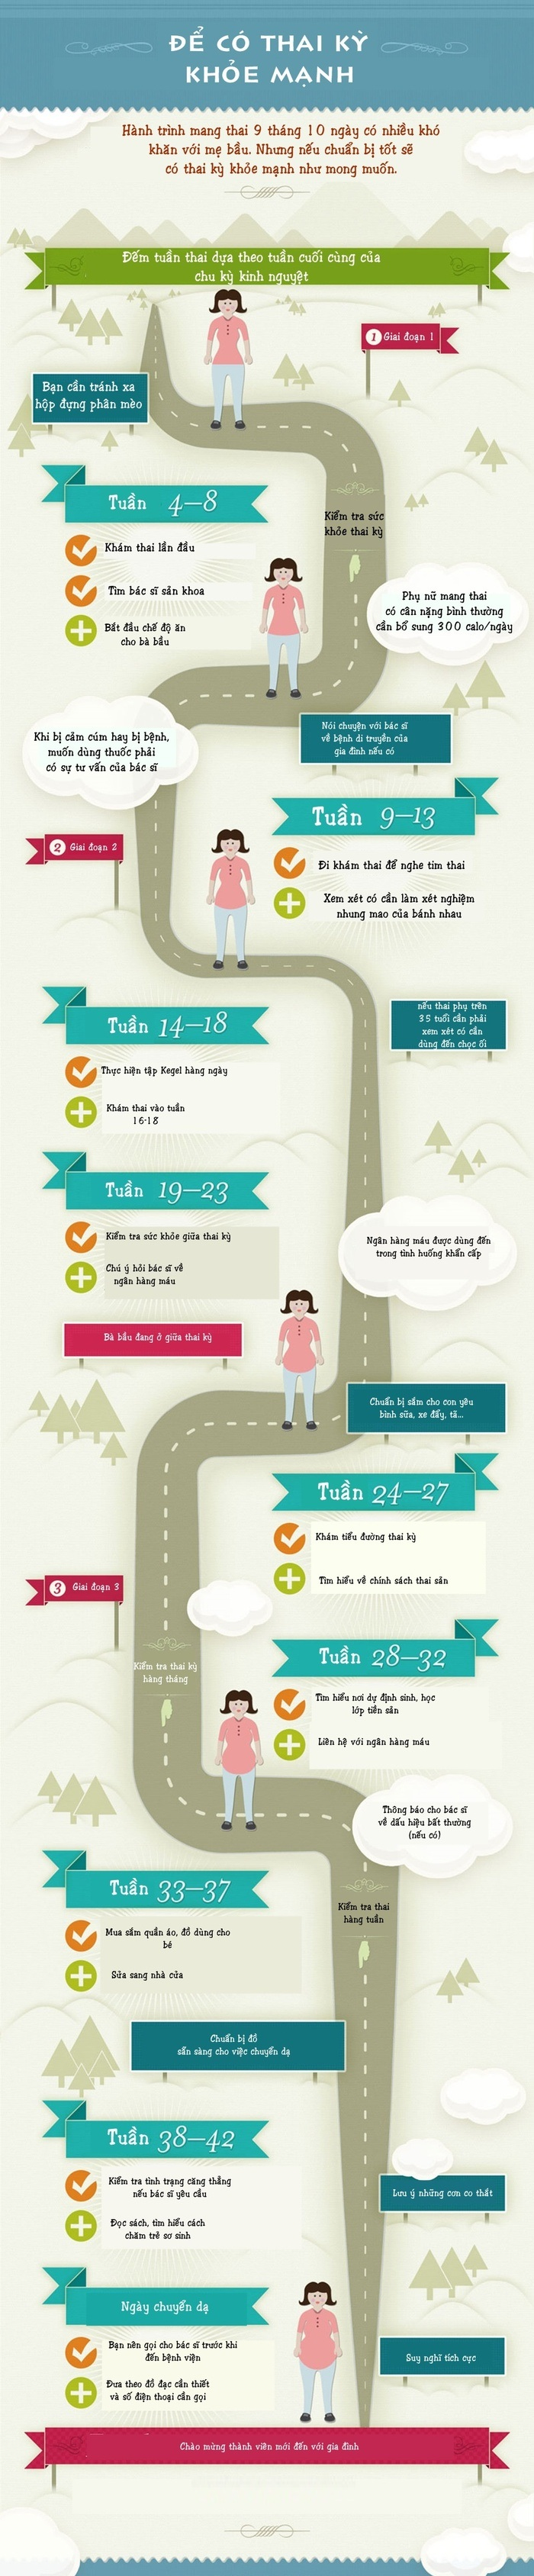 mang thai khỏe mạnh, thai kỳ khỏe mạnh, chú ý khi mang thai